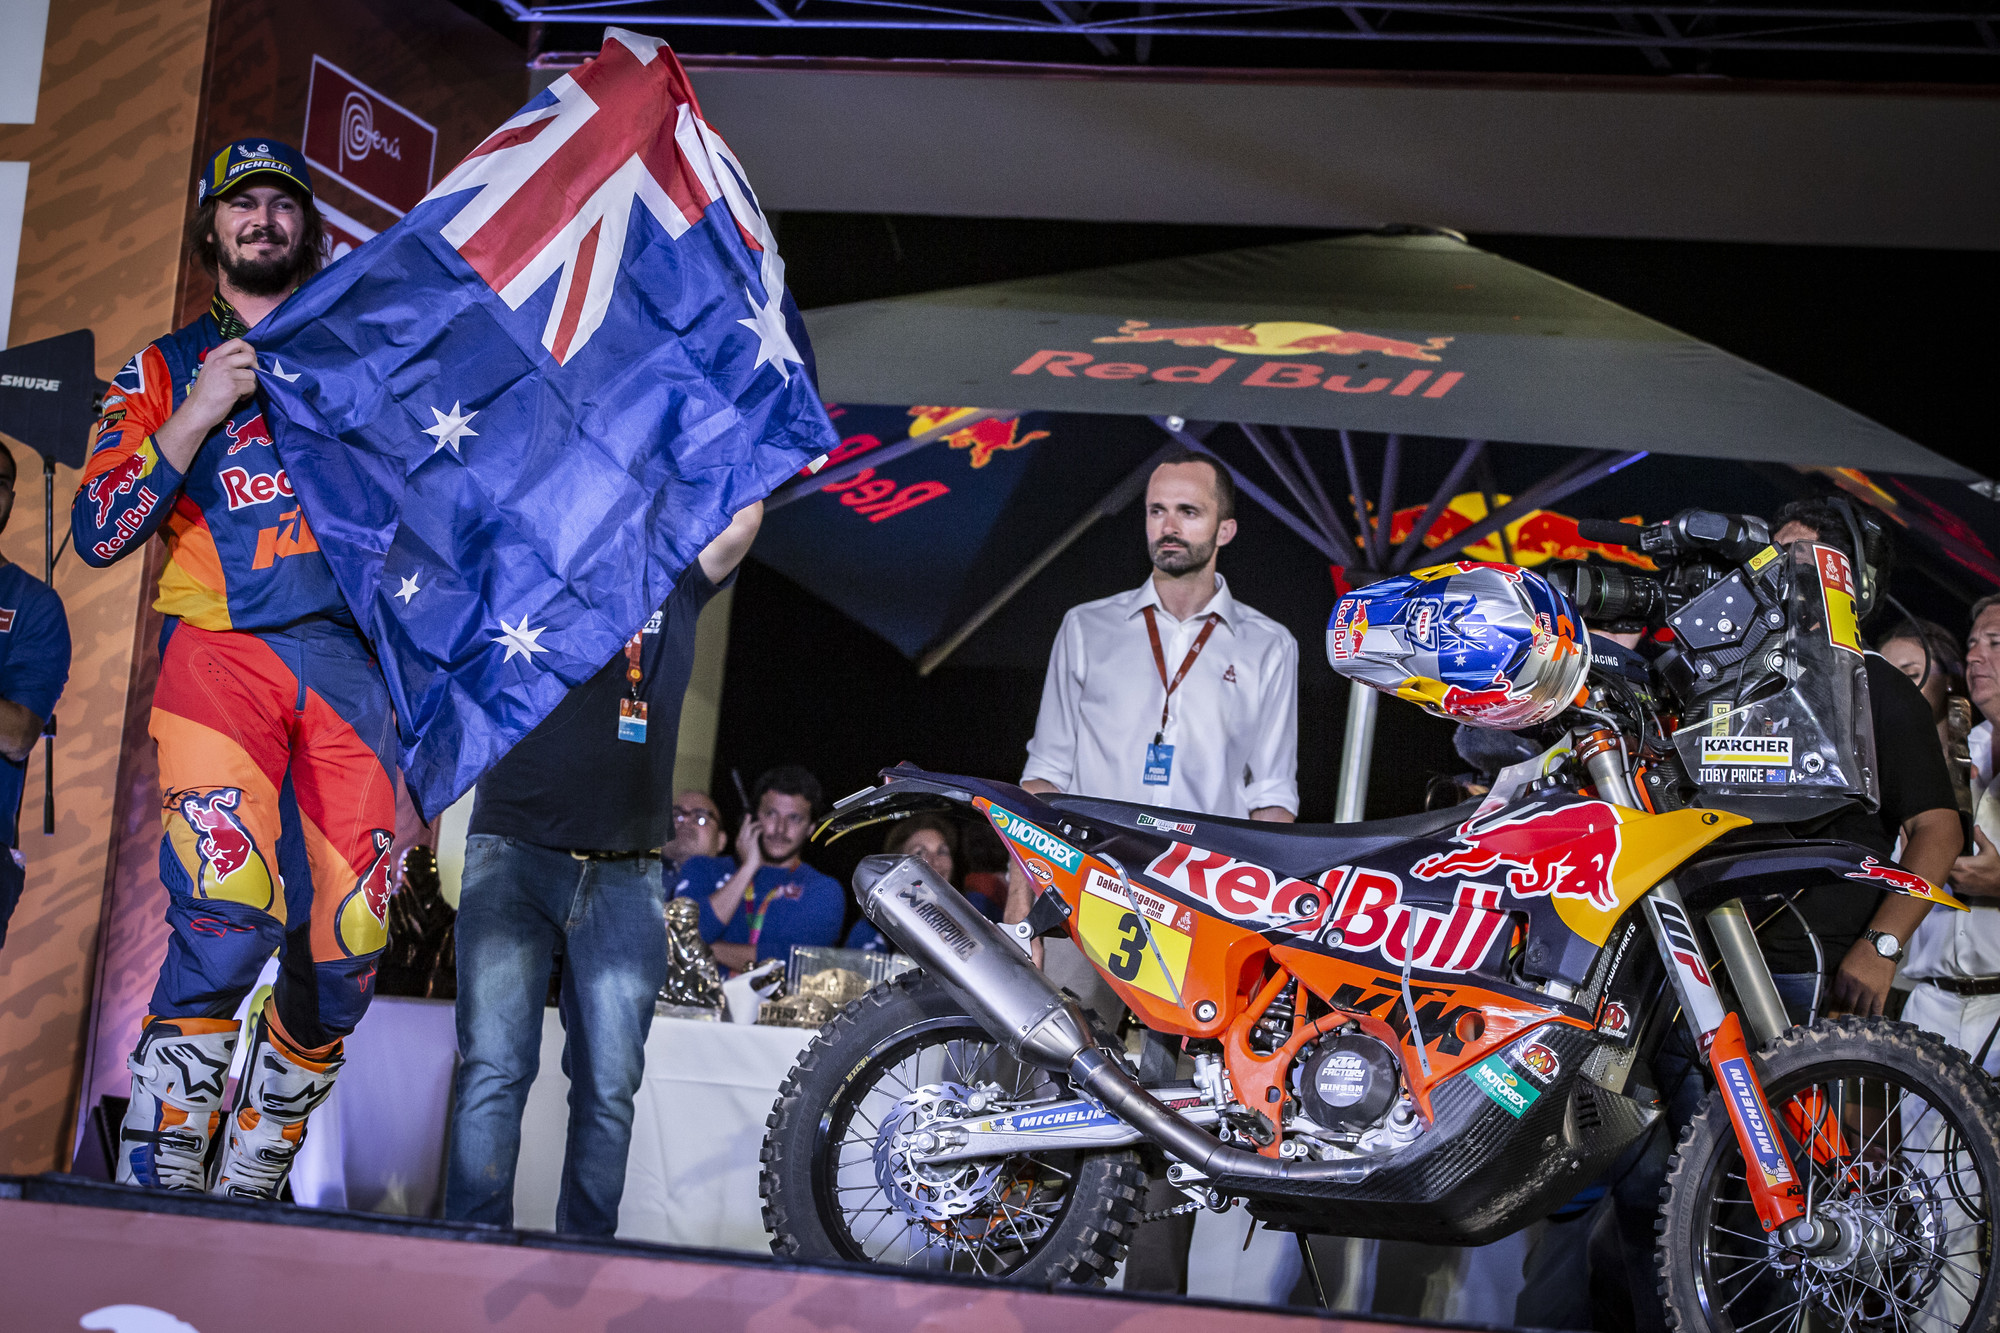 263422_toby.price_finish_Red Bull KTM Factory Racing_Dakar2019_499.jpg